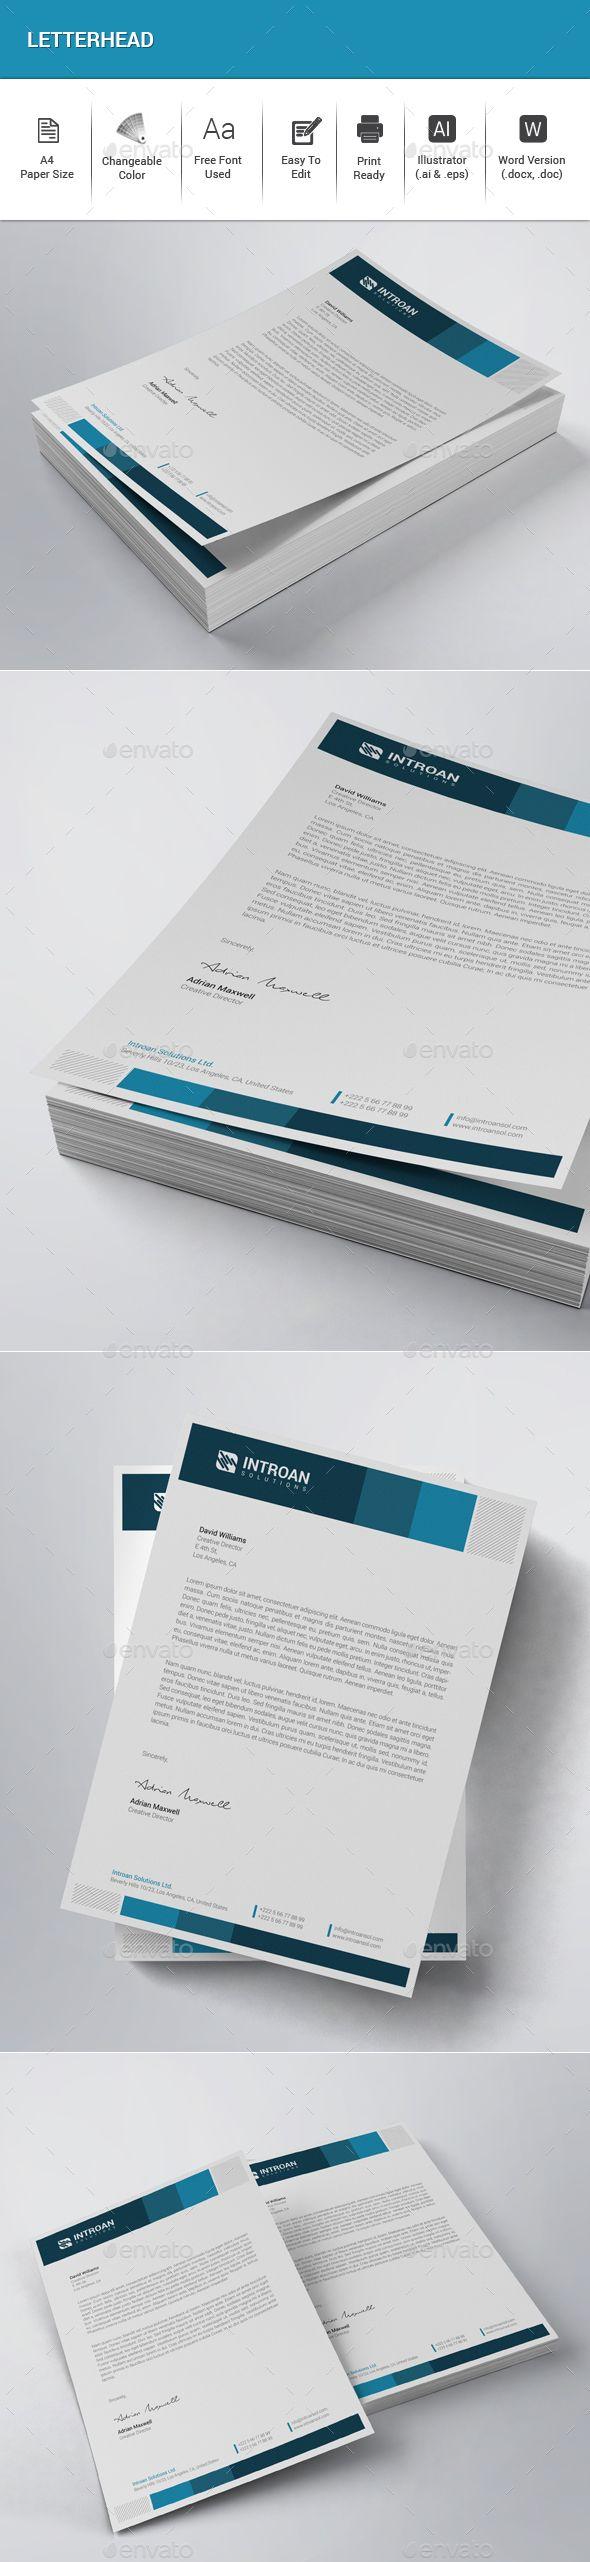 letter format on letterhead%0A Letterhead Design Template Vector EPS  AI Illustrator  MS Word